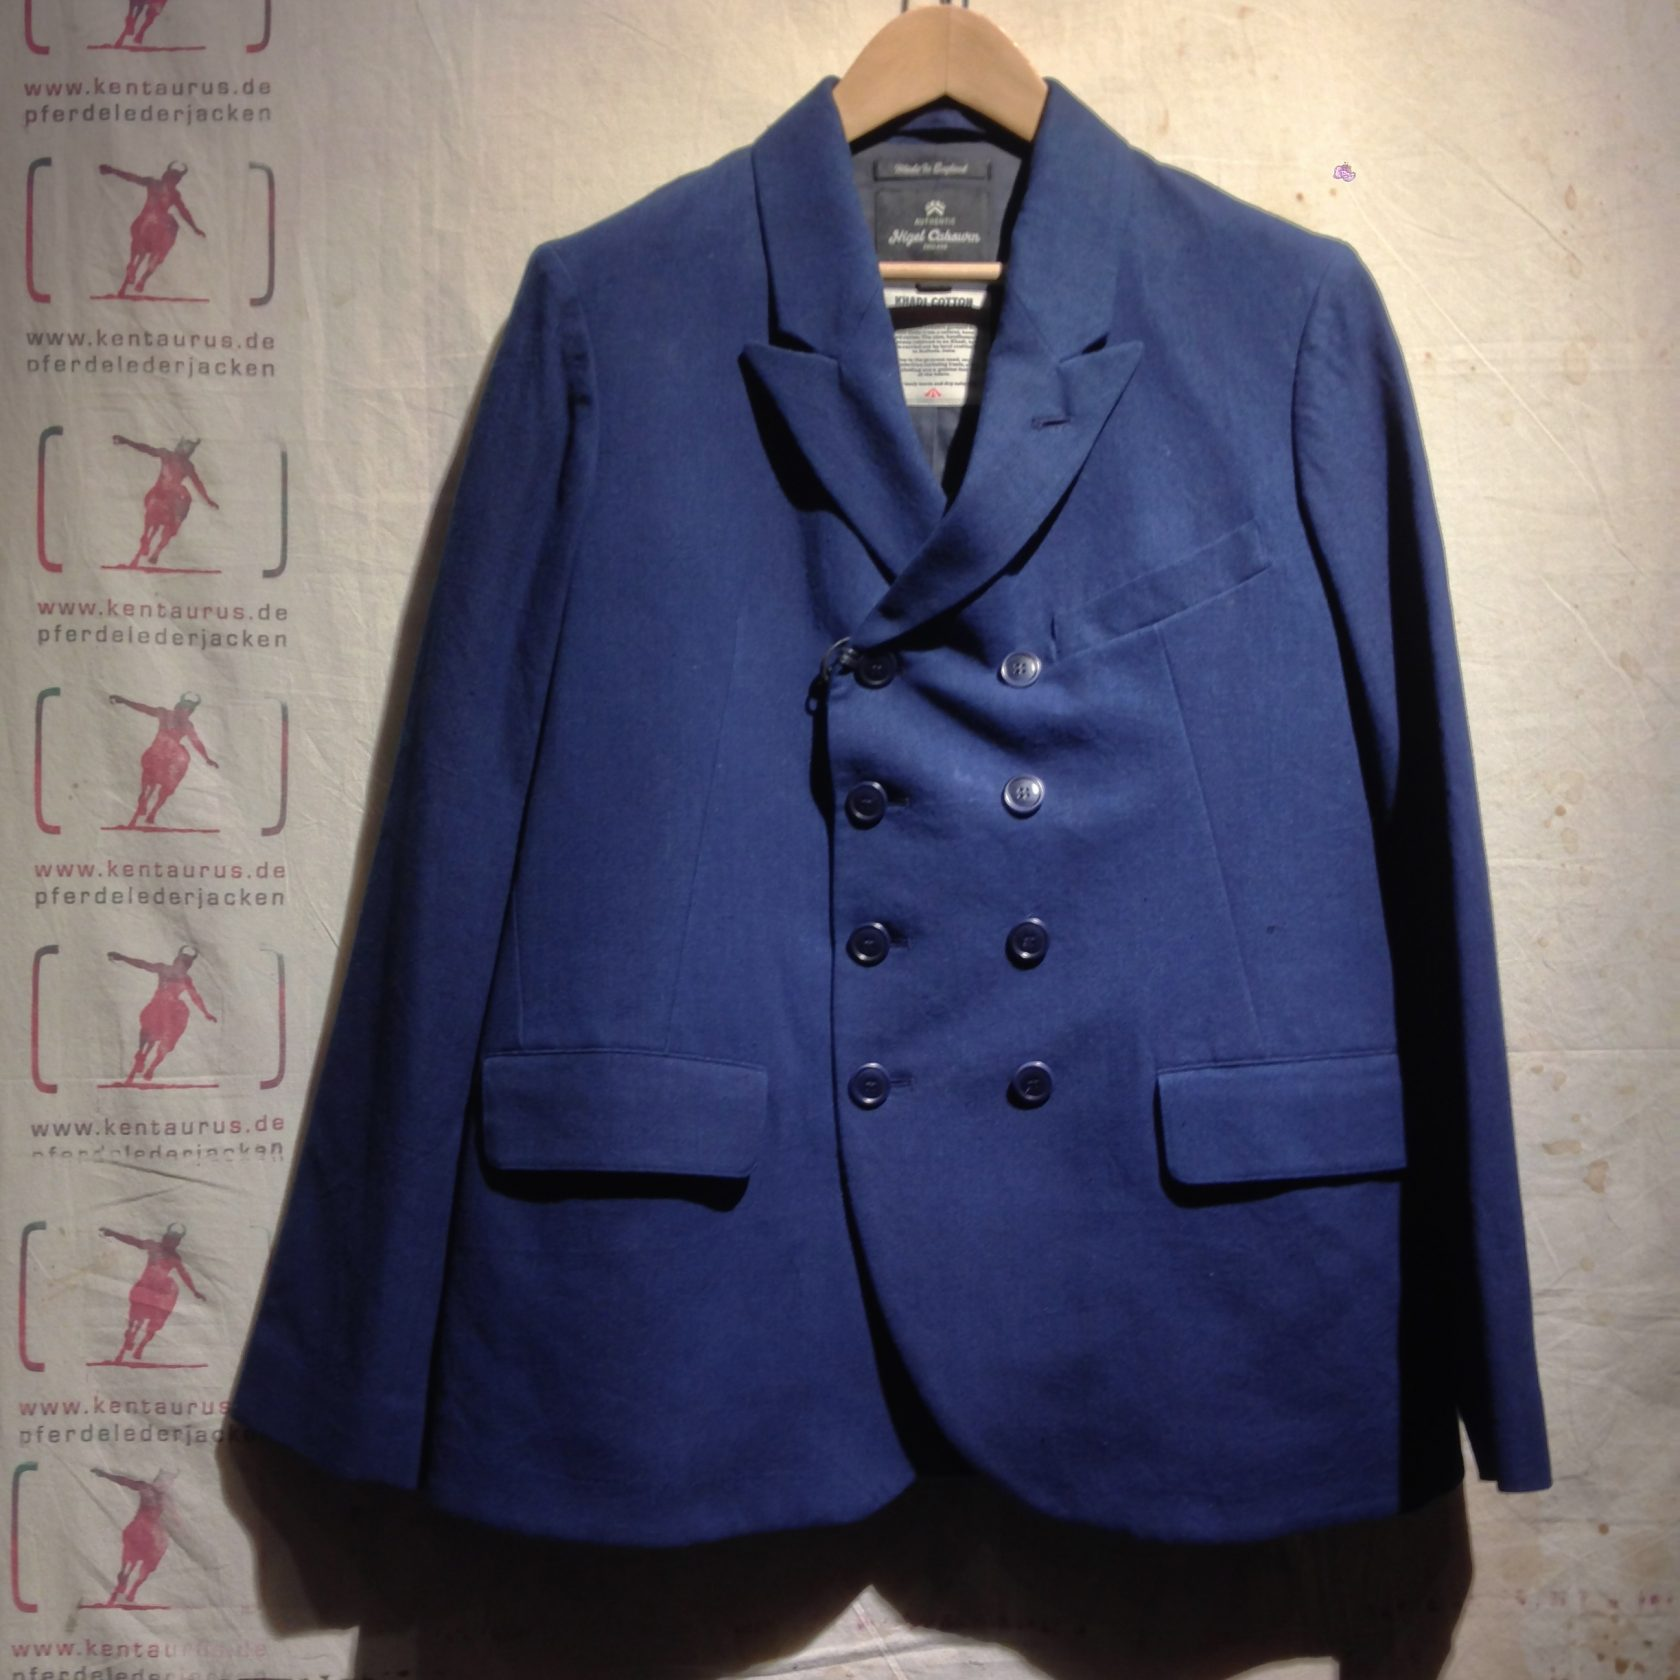 Nigel cabourn DB Jacket indigo SS14